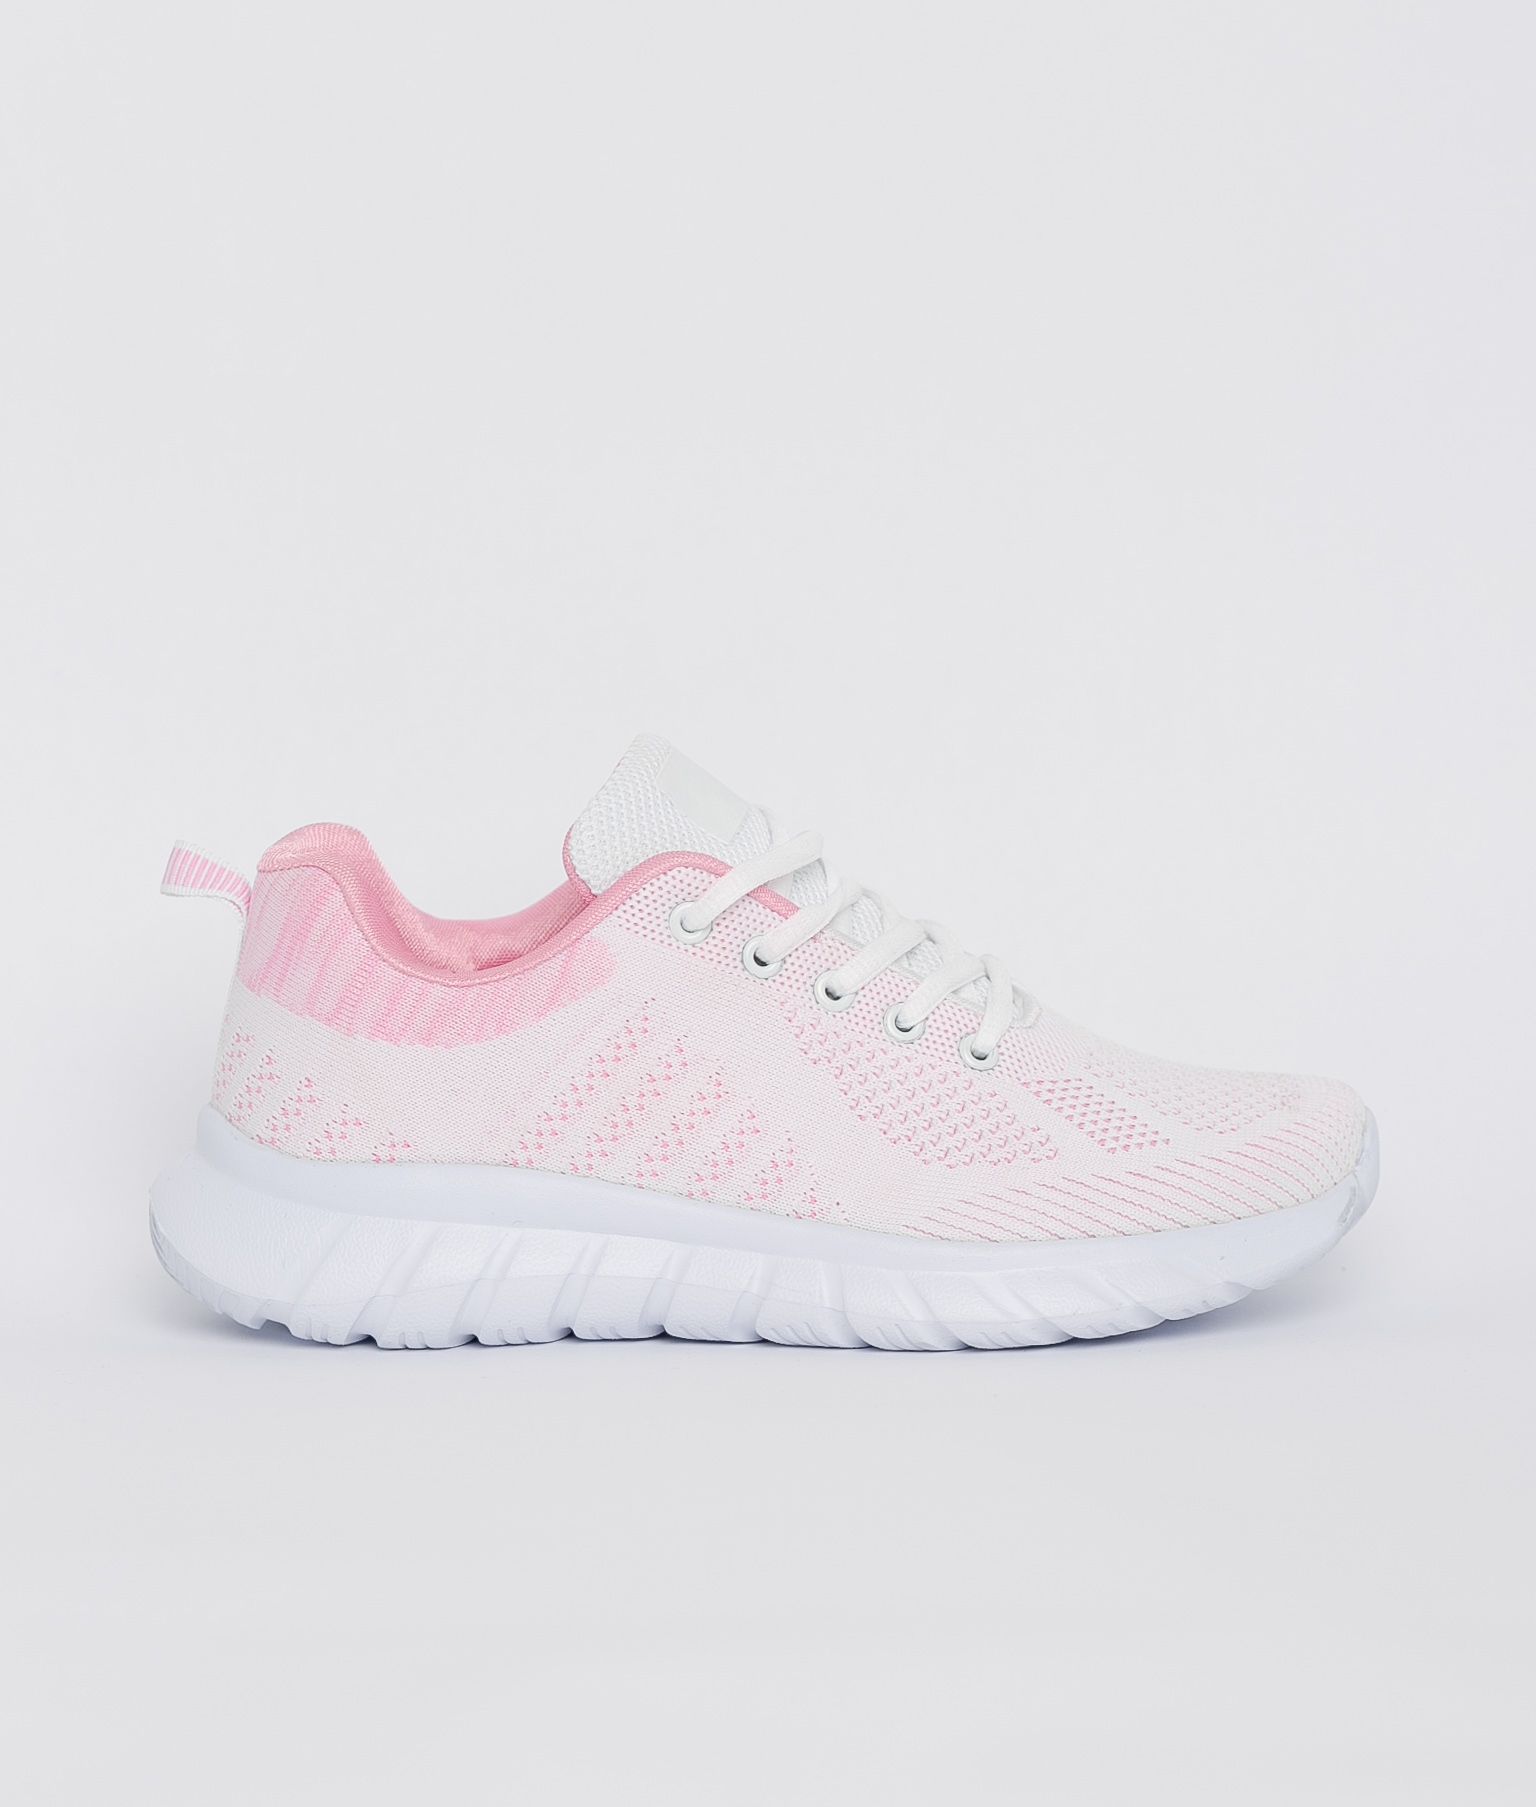 Sneakers Canda - Branco/Rosa